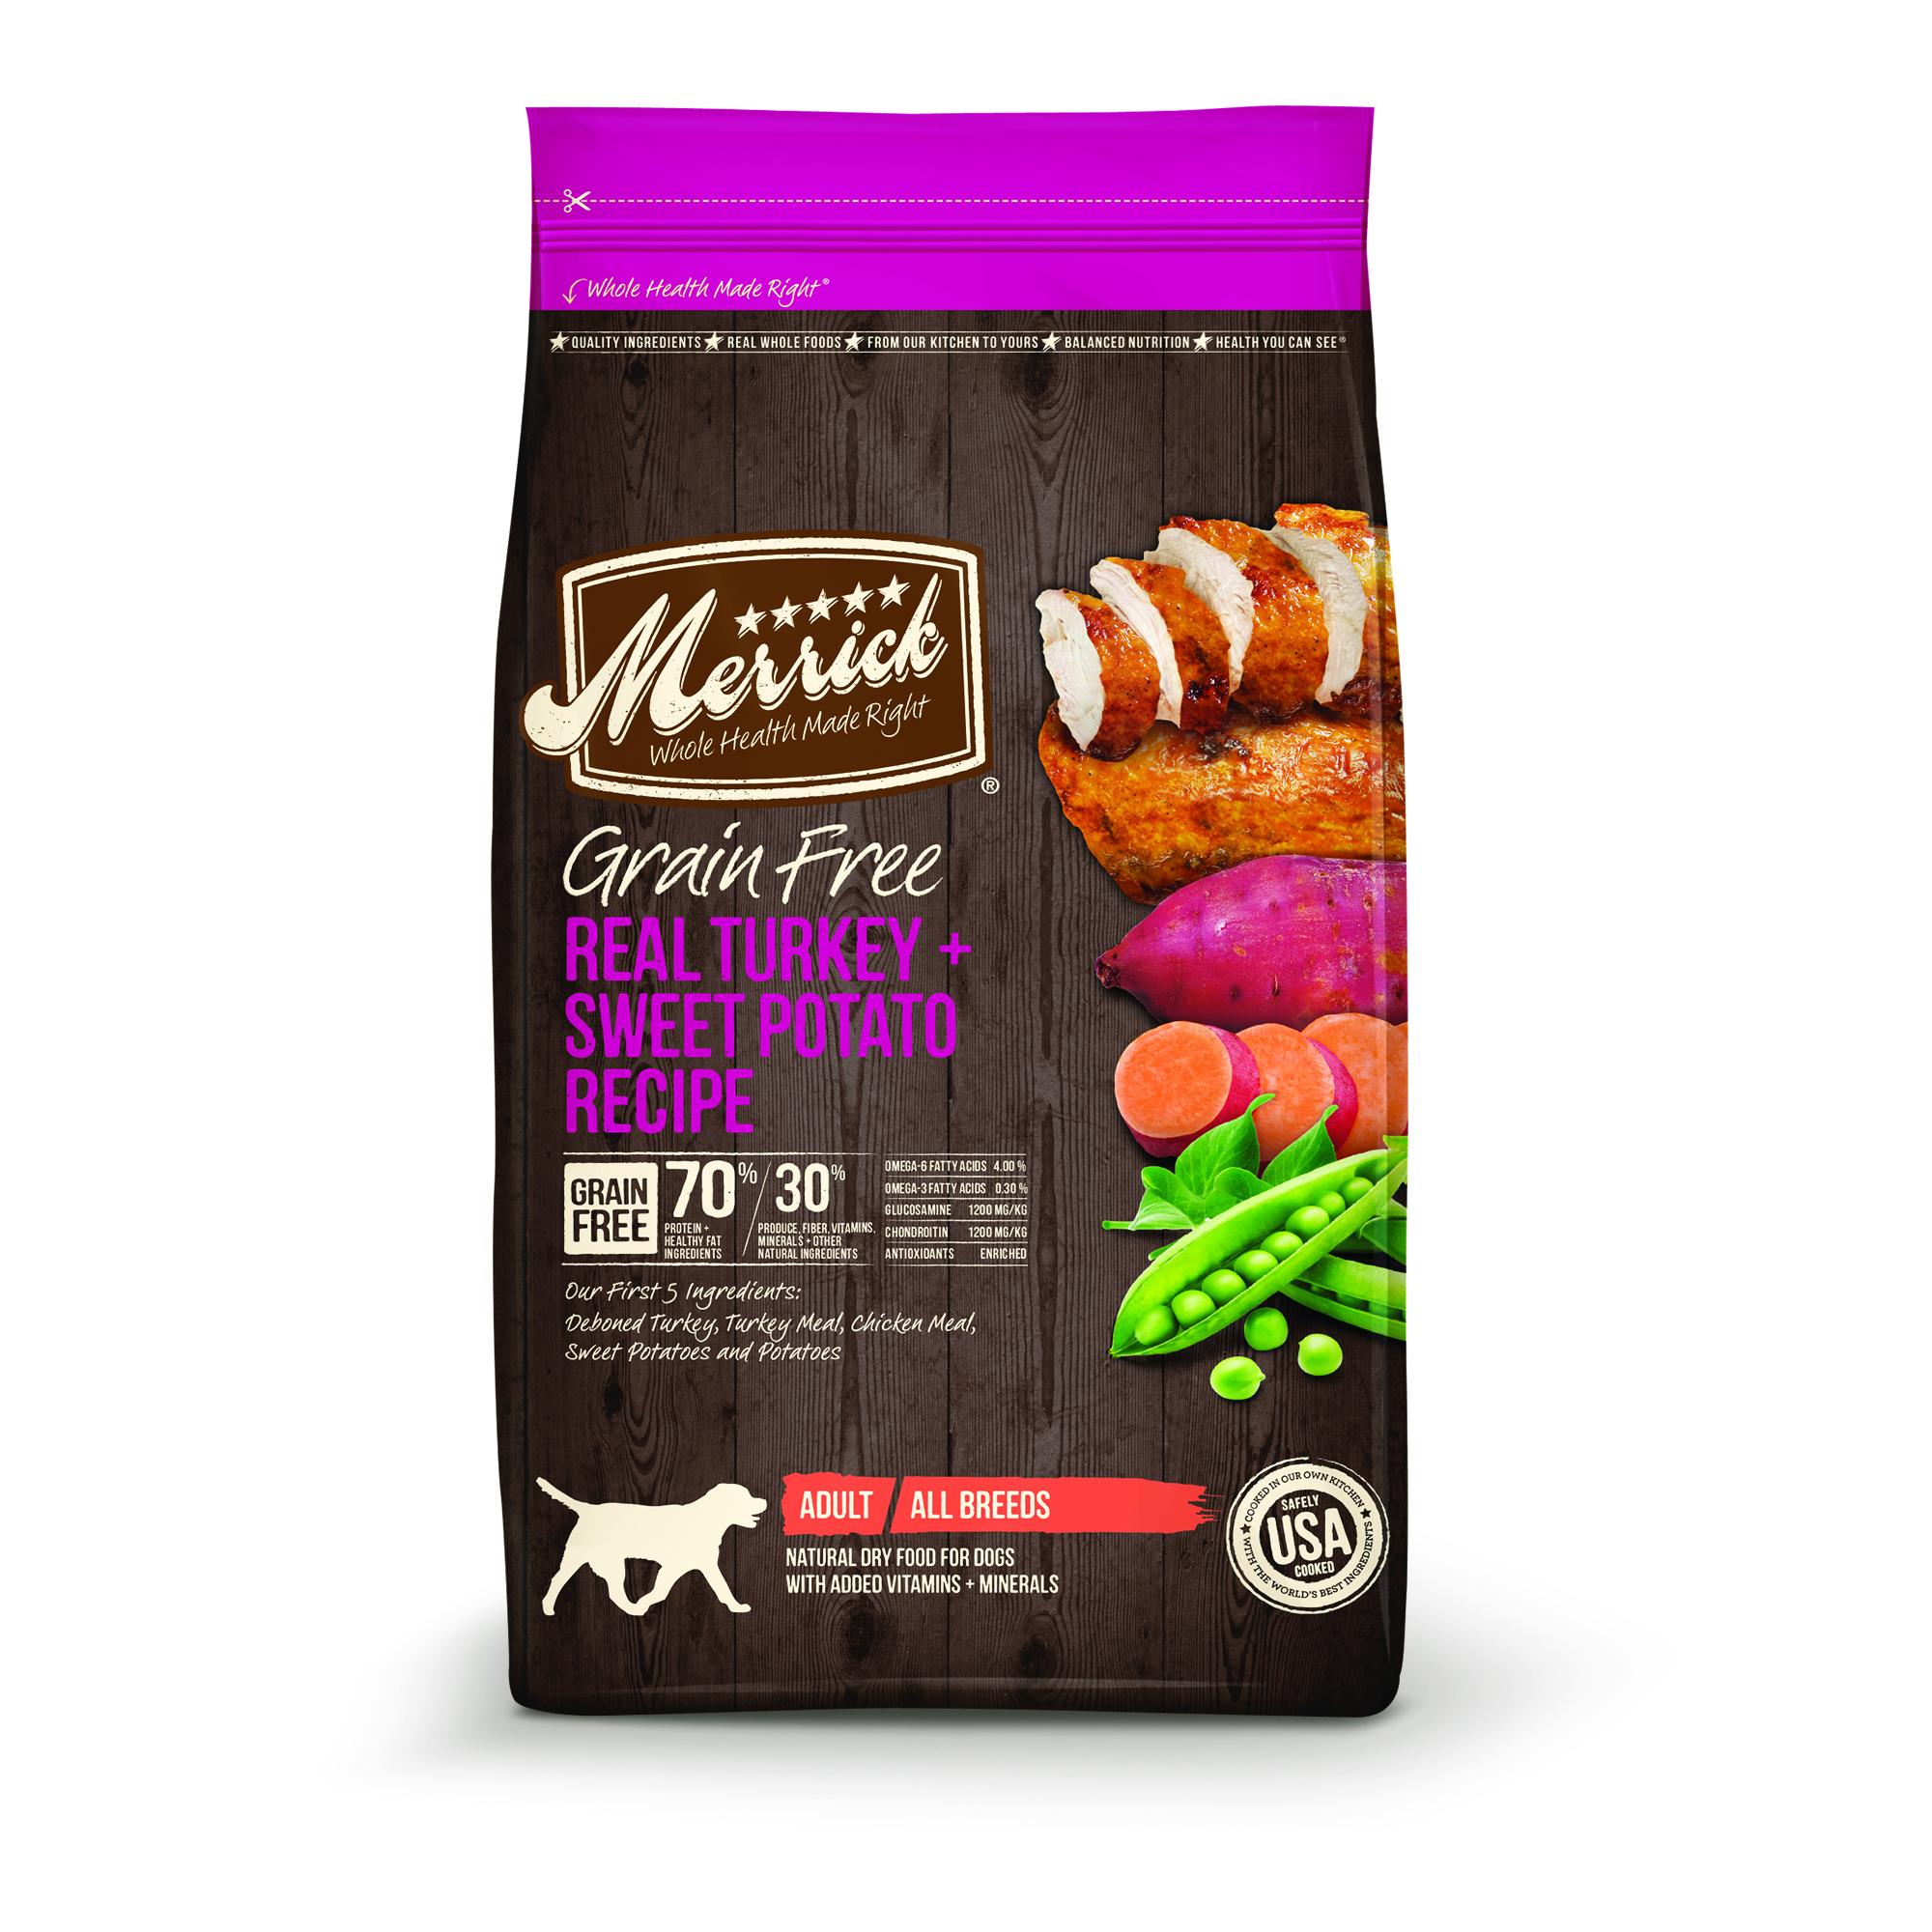 Merrick Grain-Free Real Turkey + Sweet Potato Recipe Dry Dog Food, 25 lb